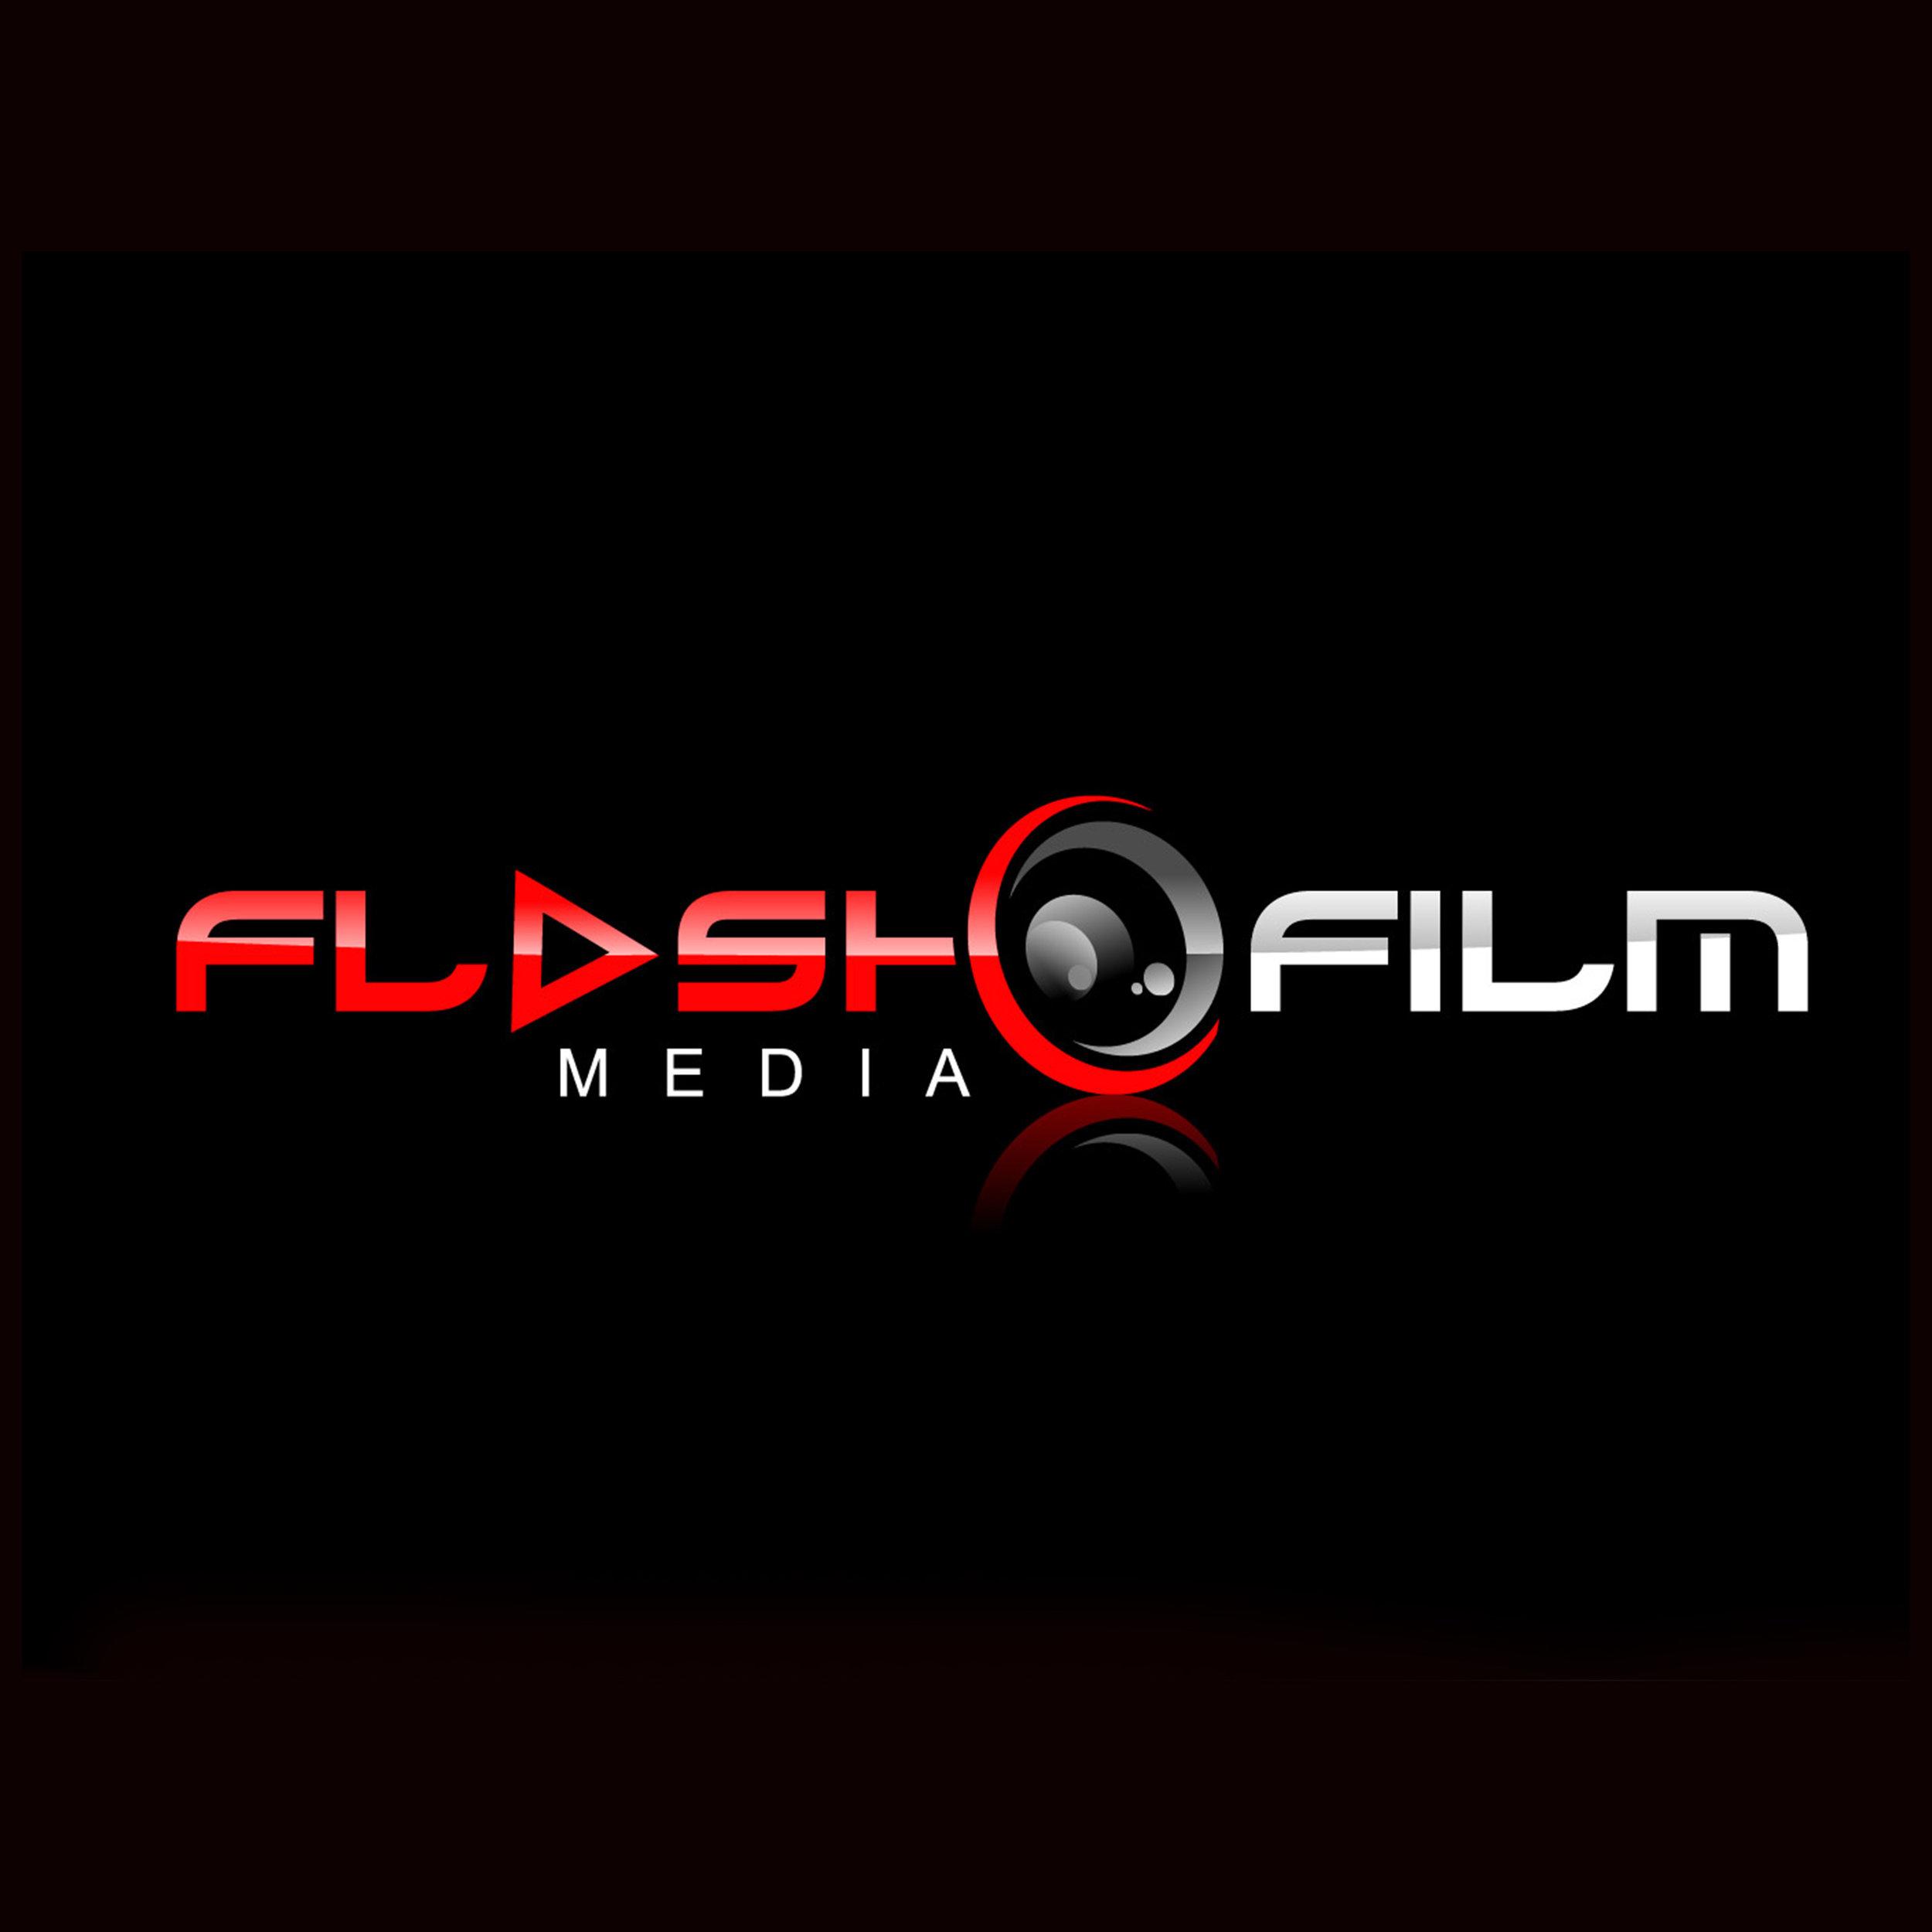 Flash Film Media SQUARE.png